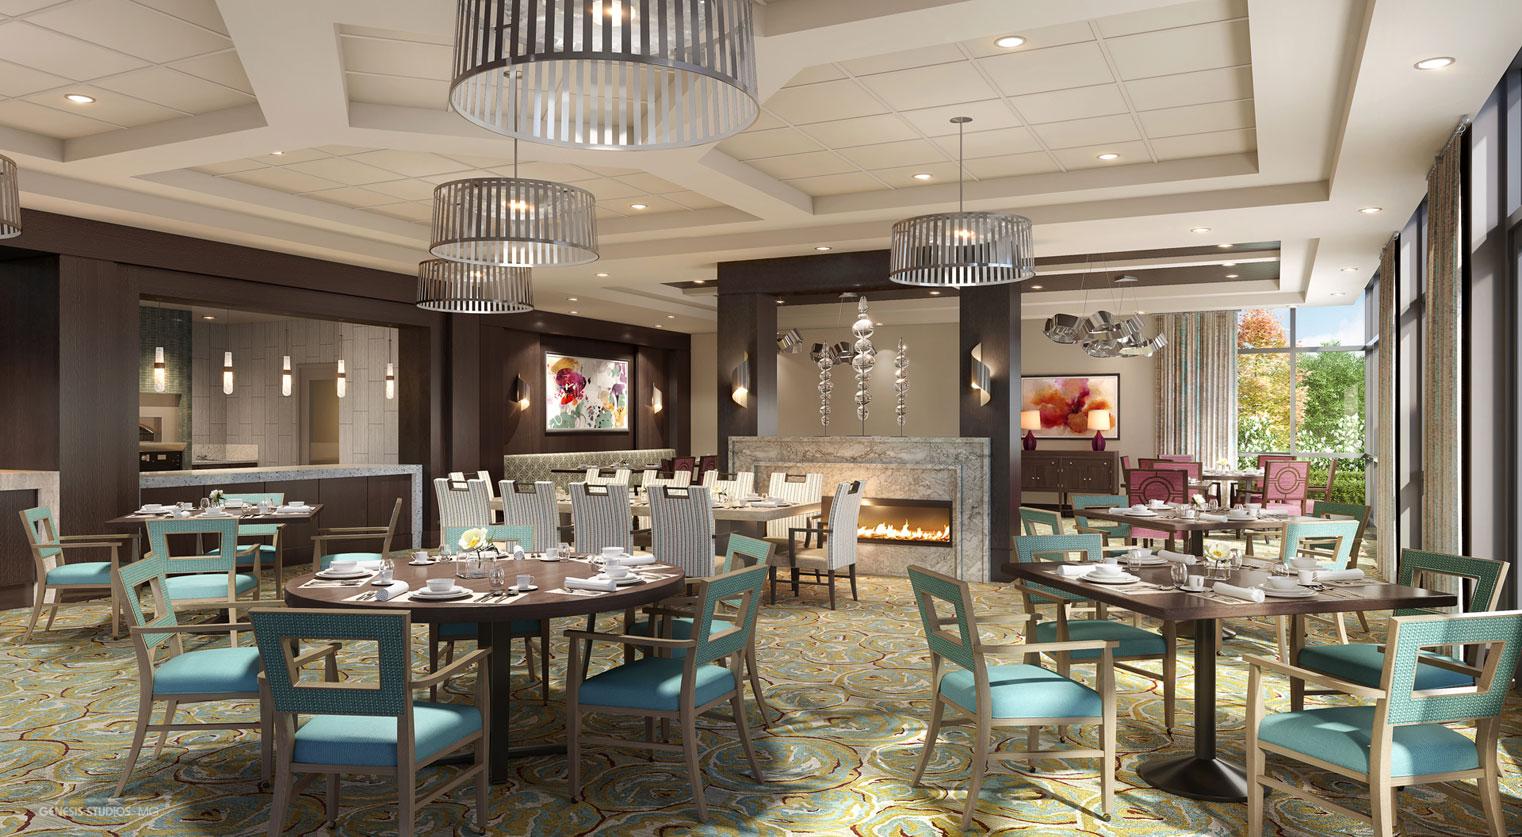 717132 Digital Photorealistic Architectural Rendering of Park Ridge Dining for Senior Lifestyle Corporation